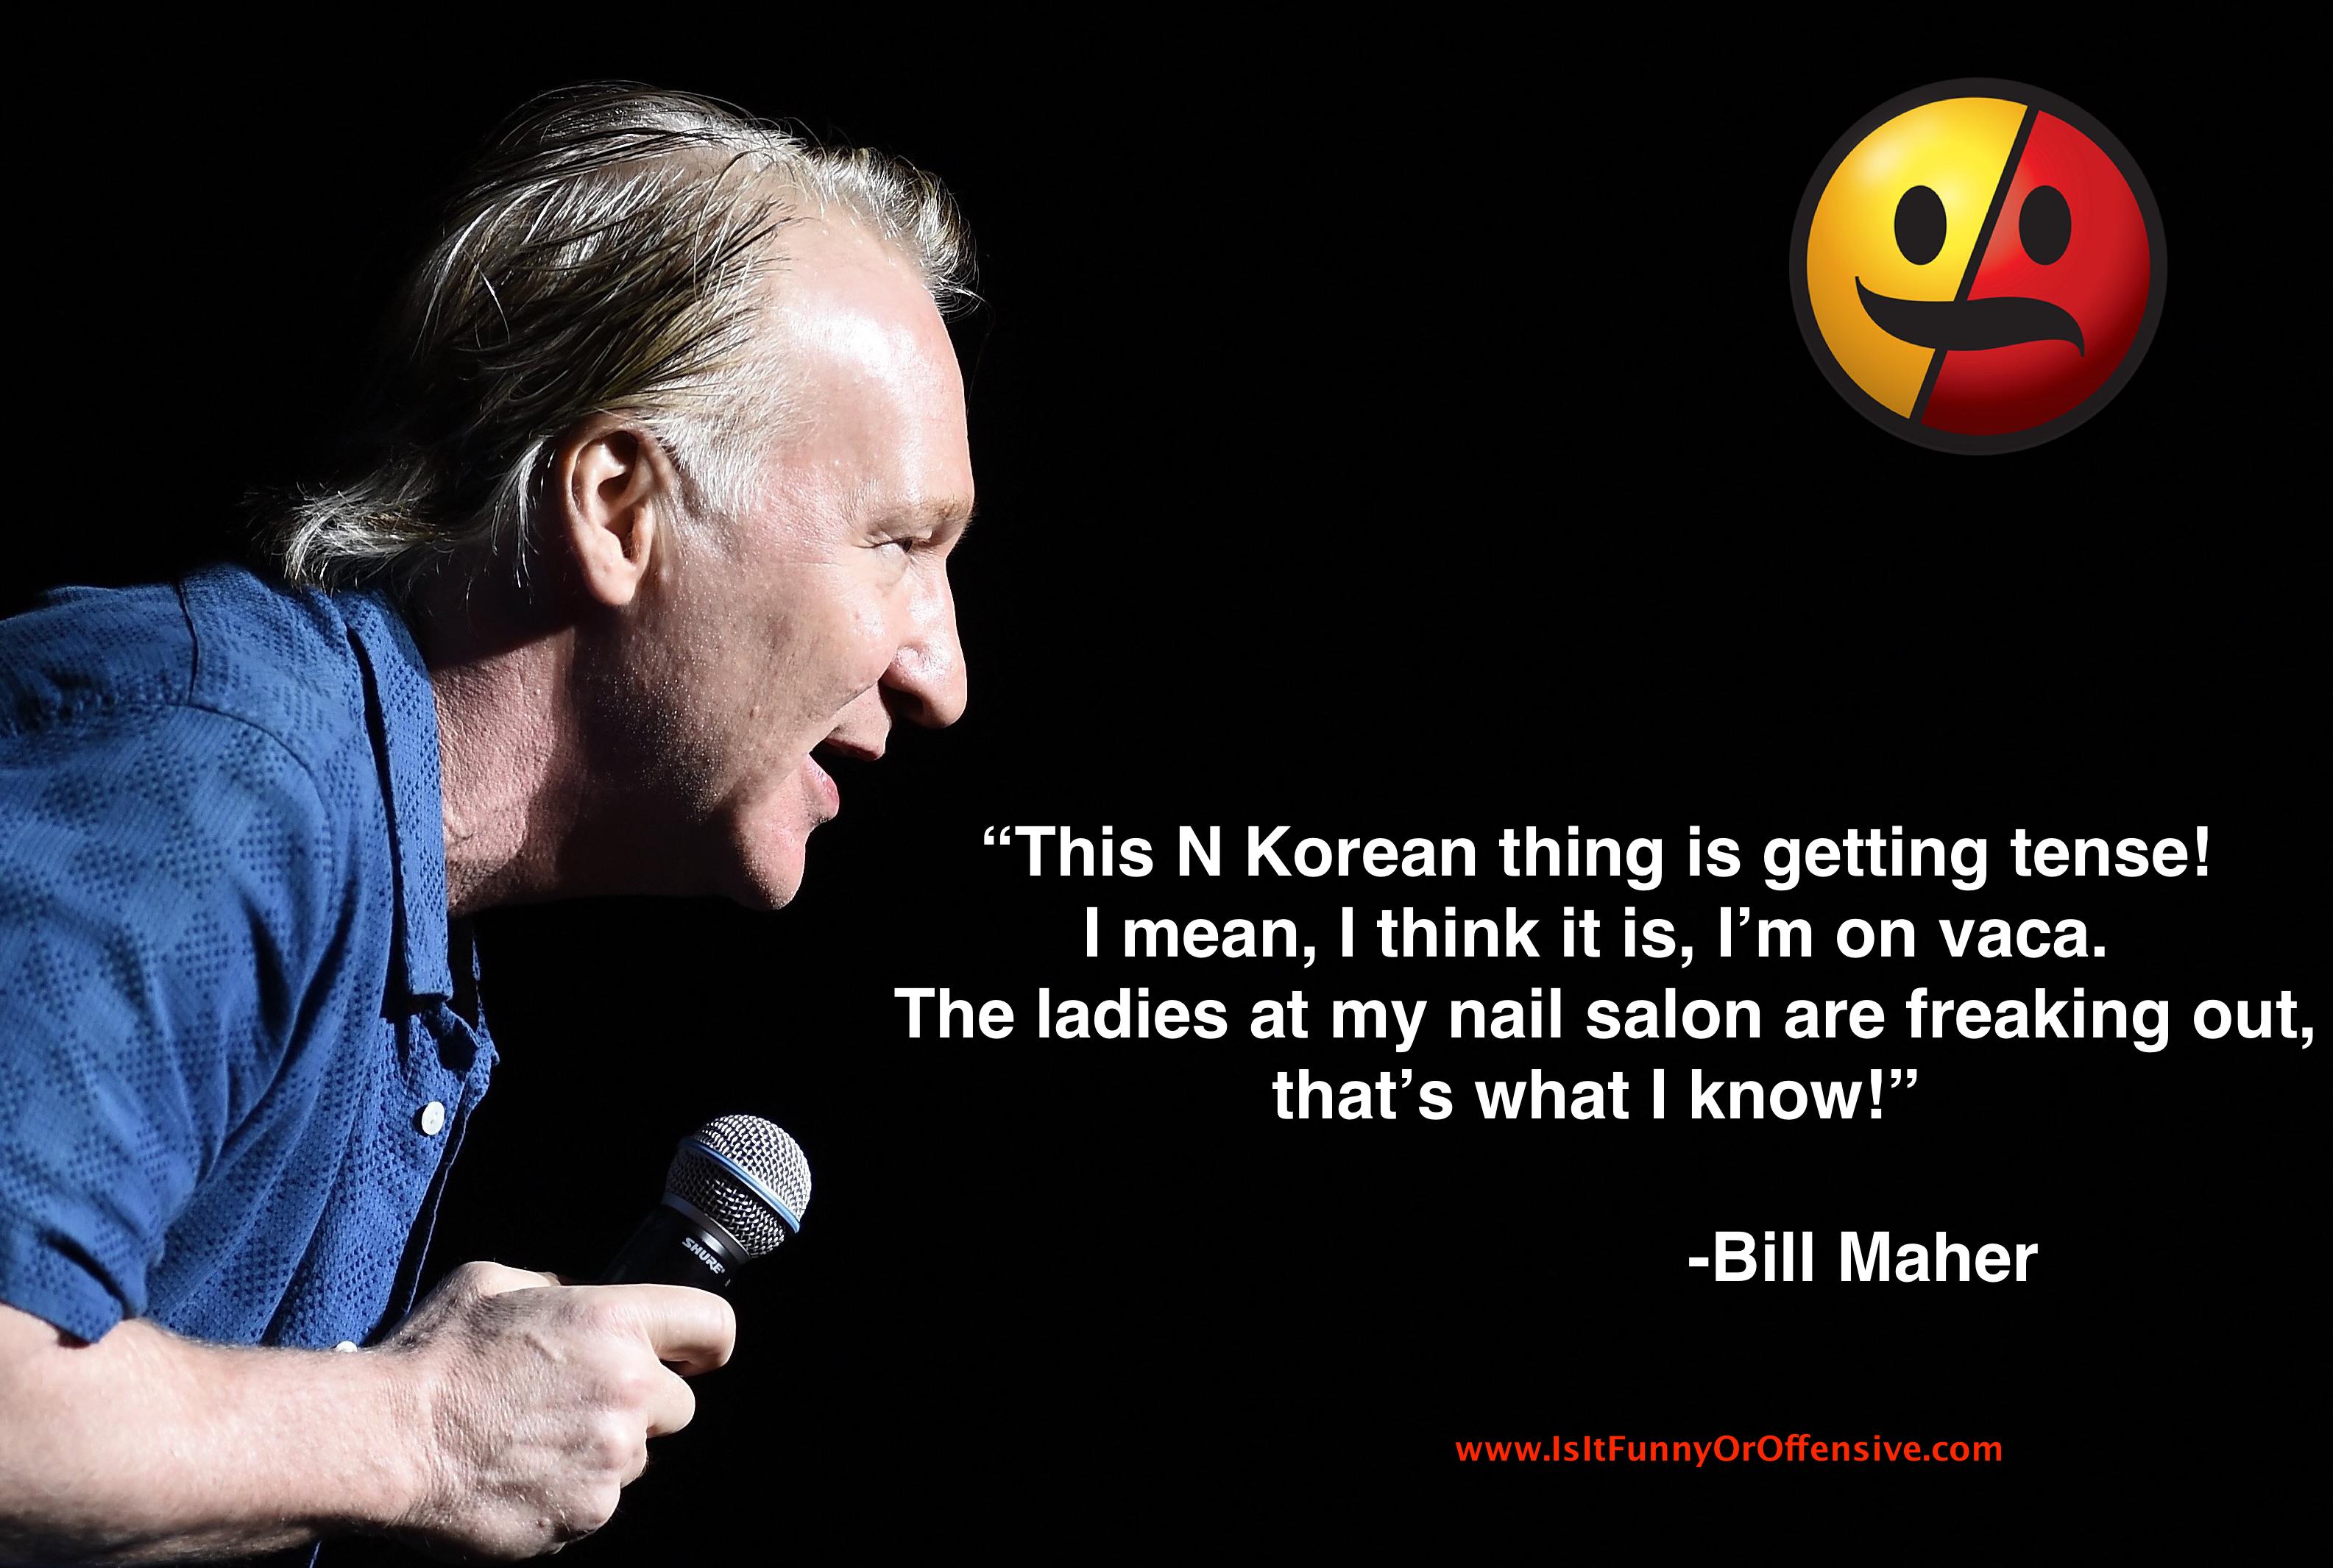 Bill Maher Under Fire for Korean Tweet